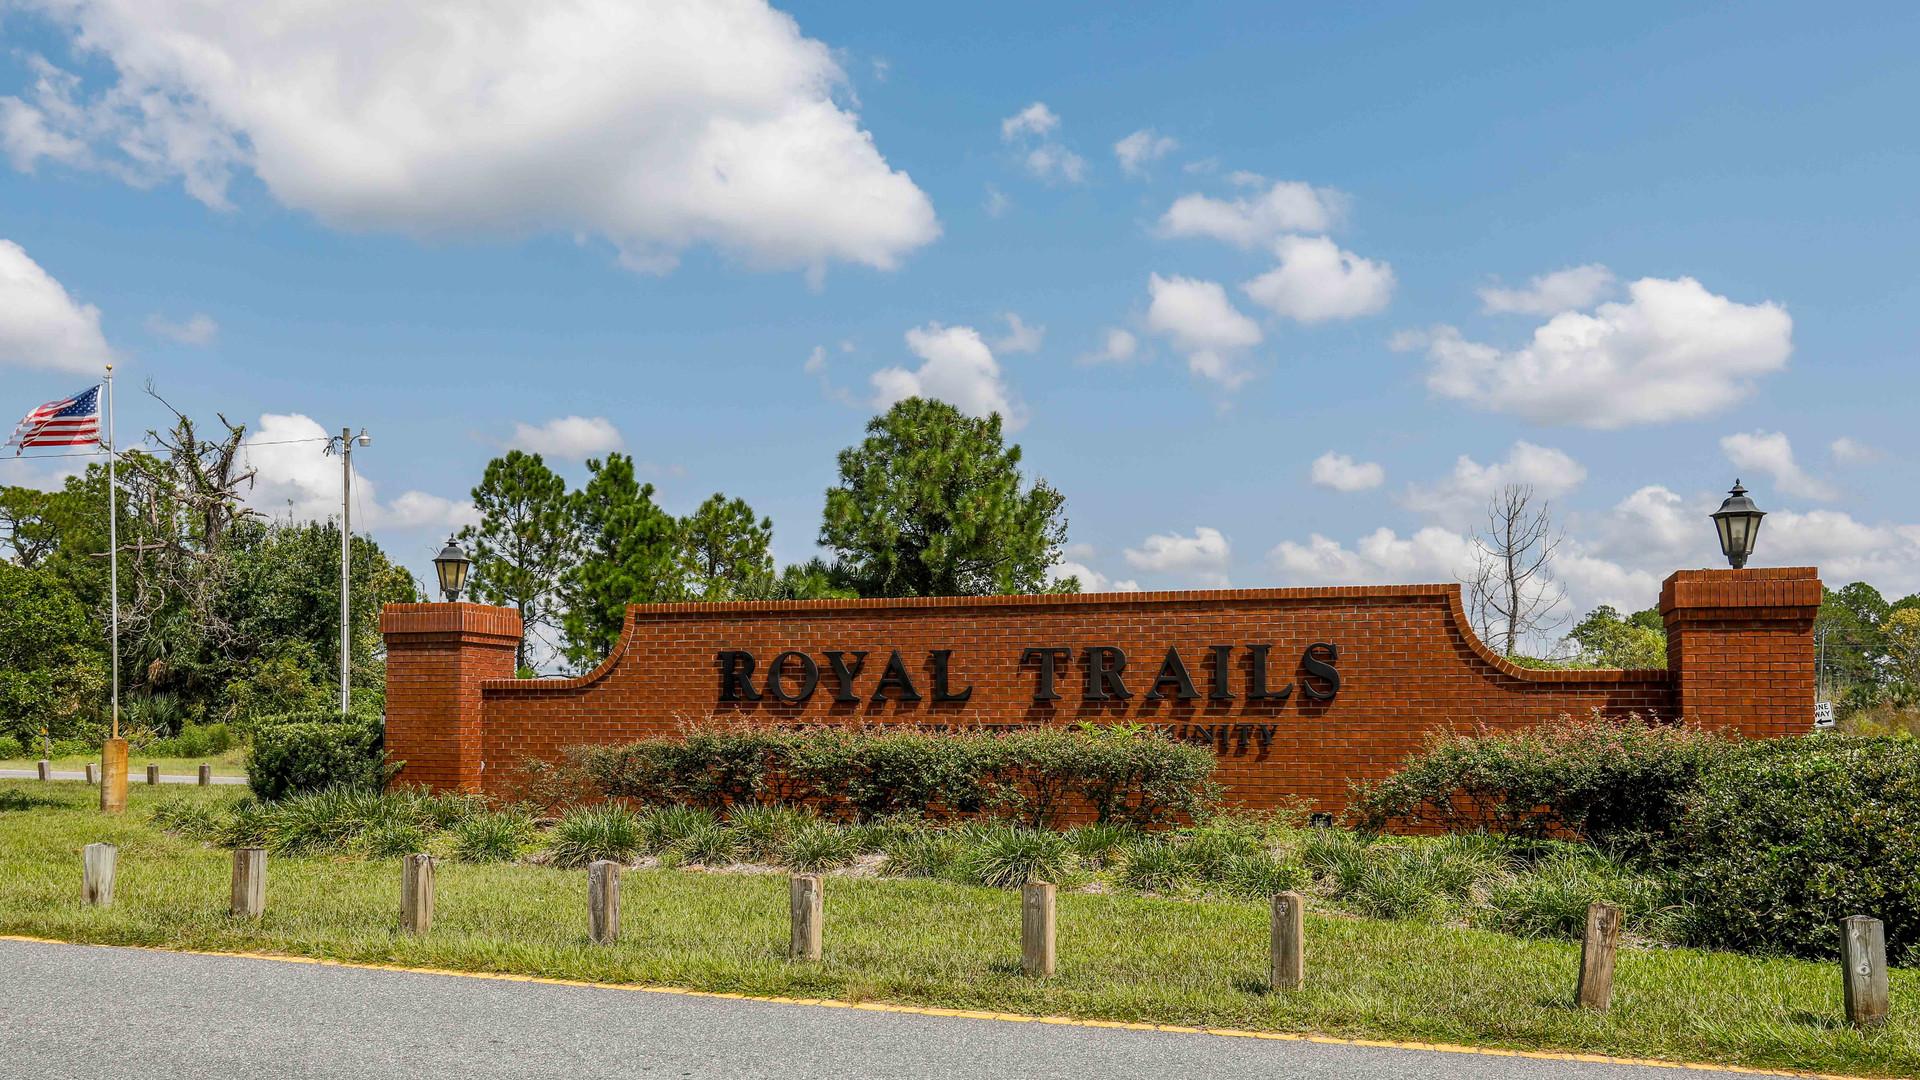 Royal Trails